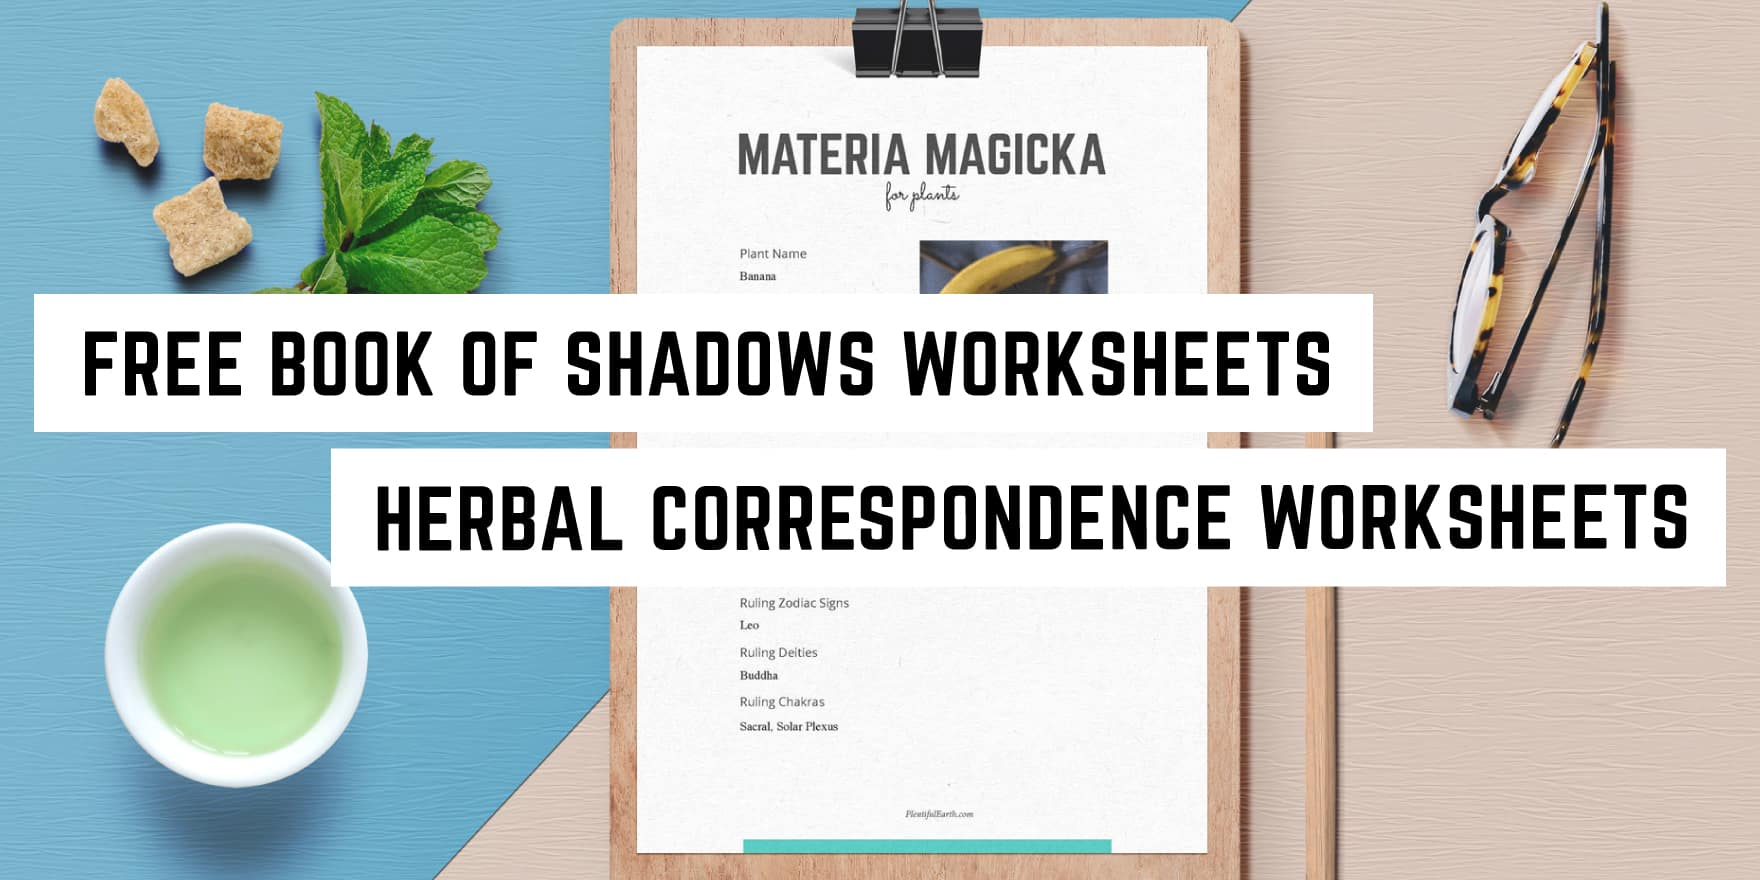 Free Materia Magicka Worksheets Plentiful Earth